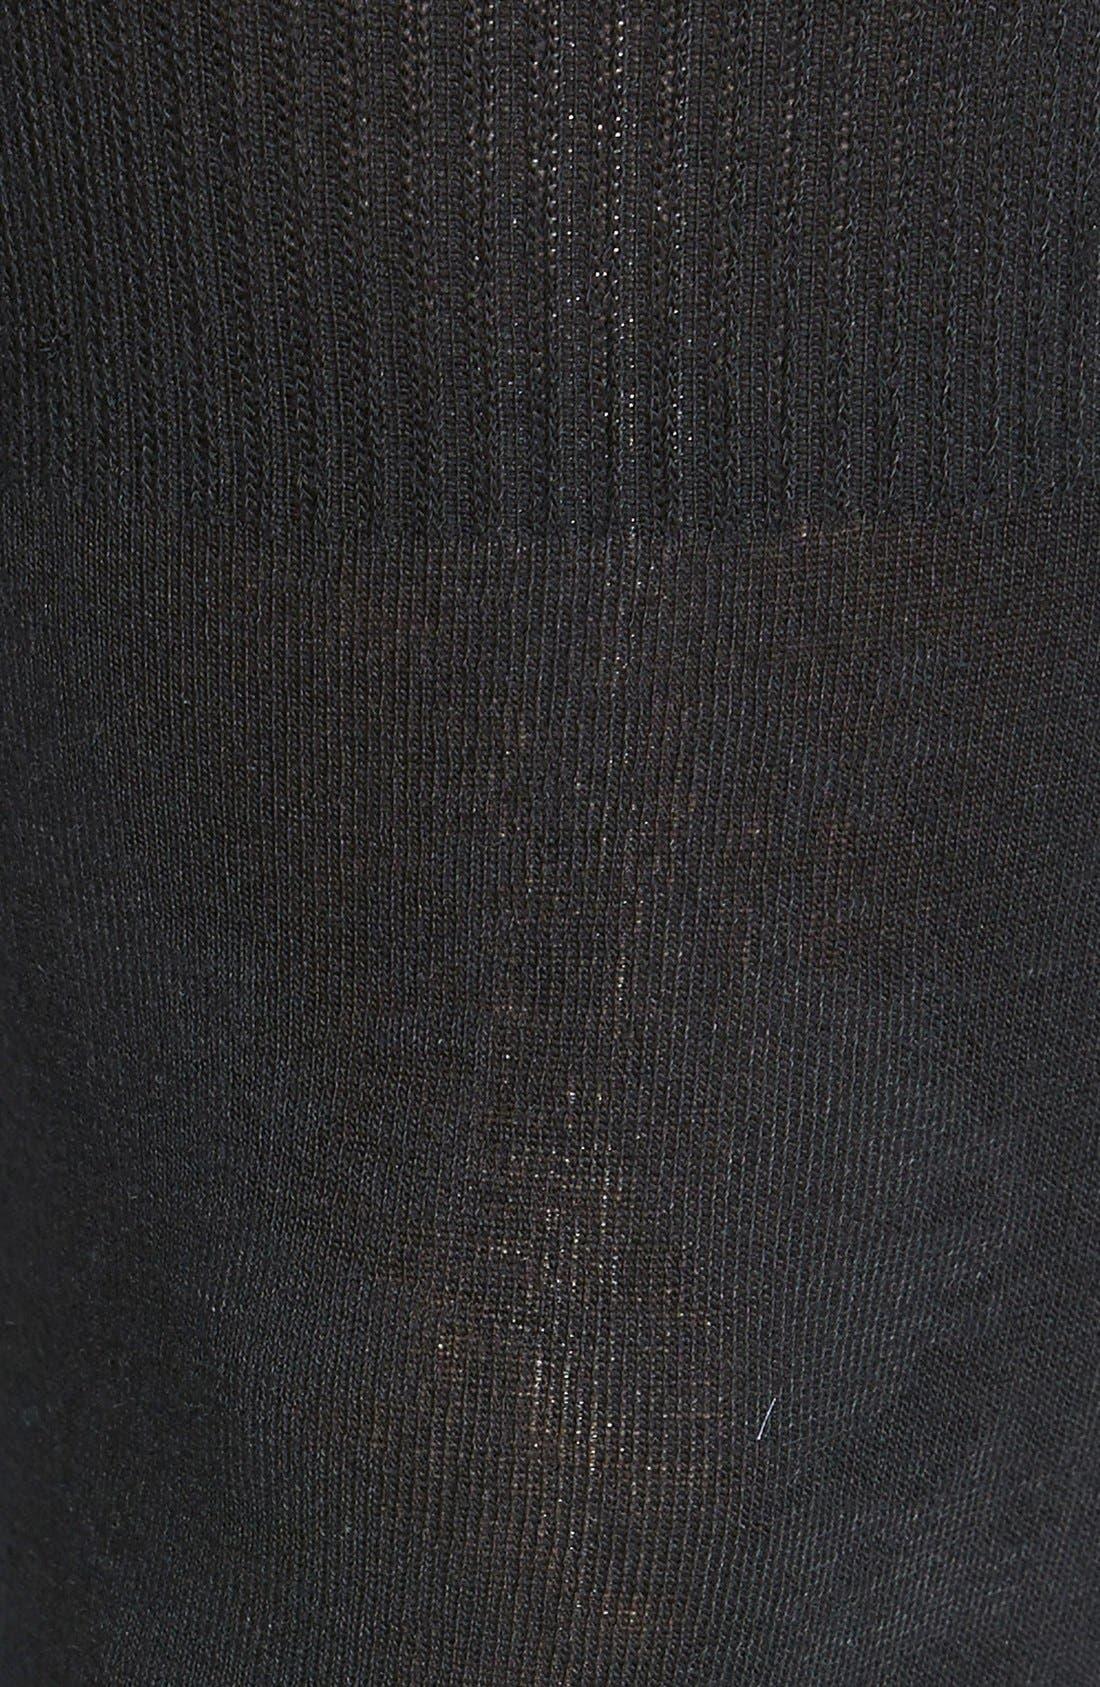 Alternate Image 2  - Pretty Polly 'Secret Socks' Tights